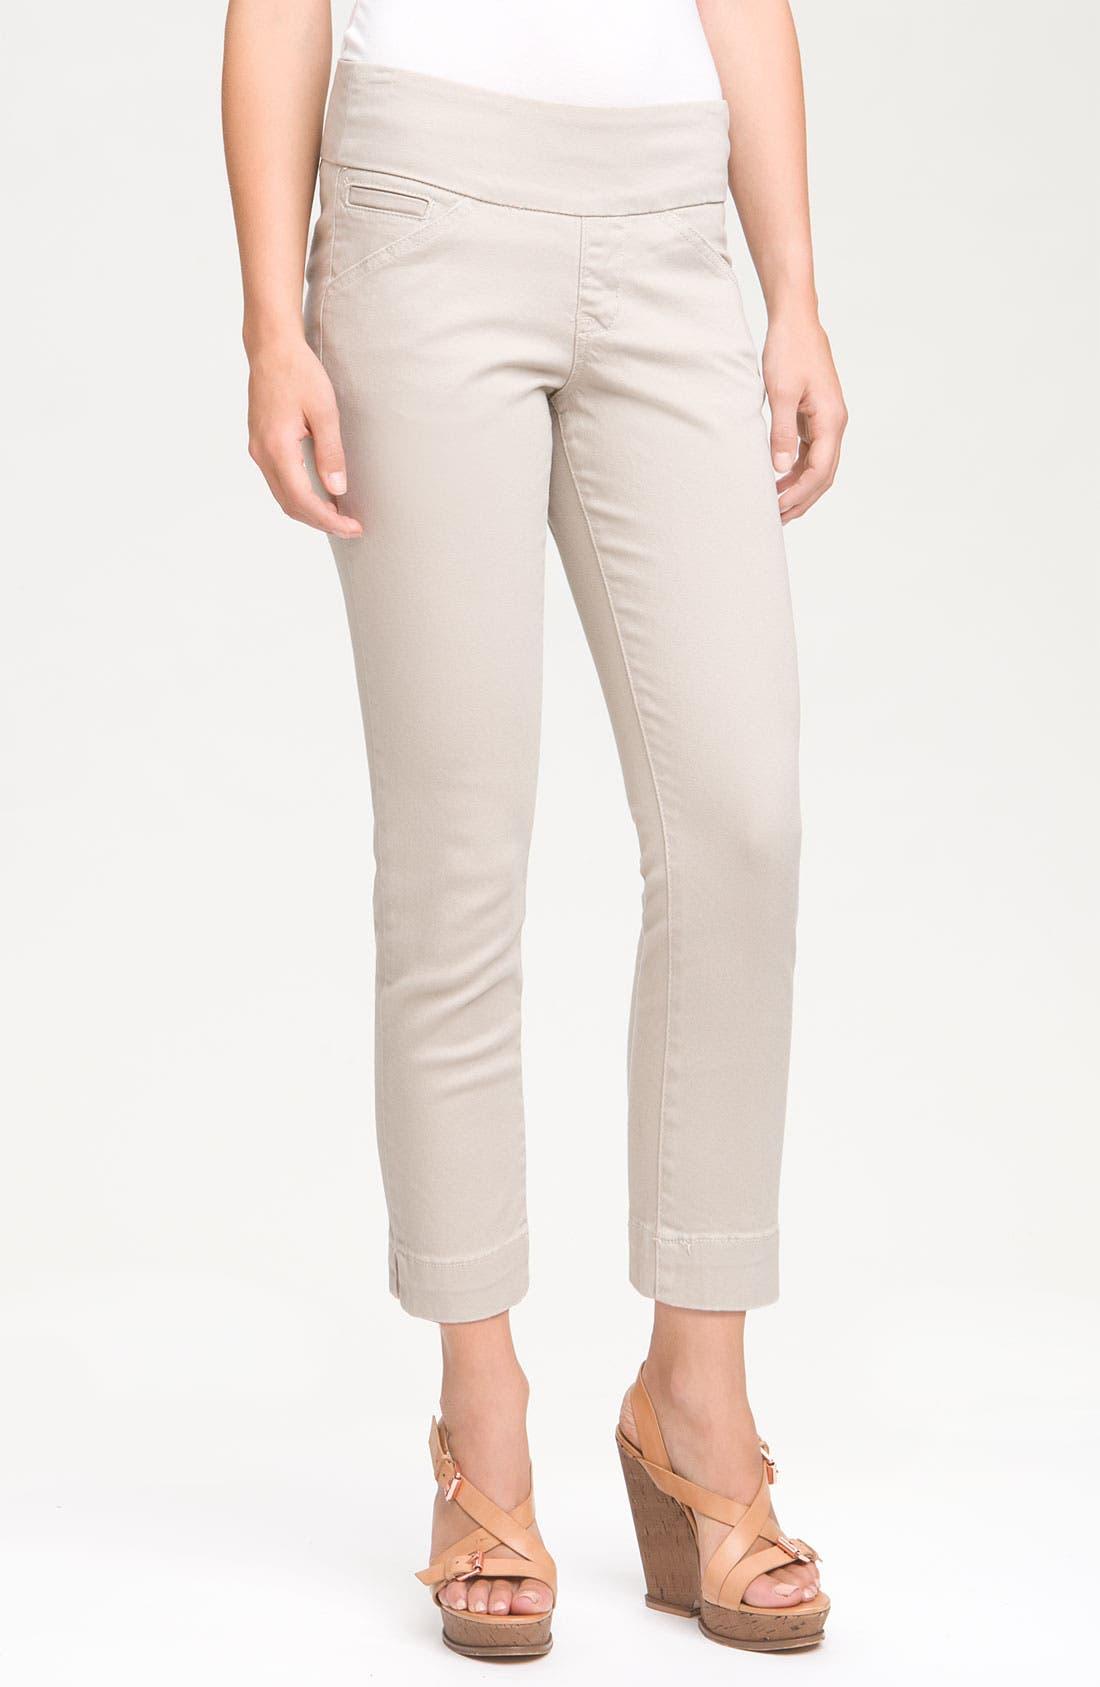 Alternate Image 1 Selected - Jag Jeans 'Attie' Slim Ankle Jeans (Petite)